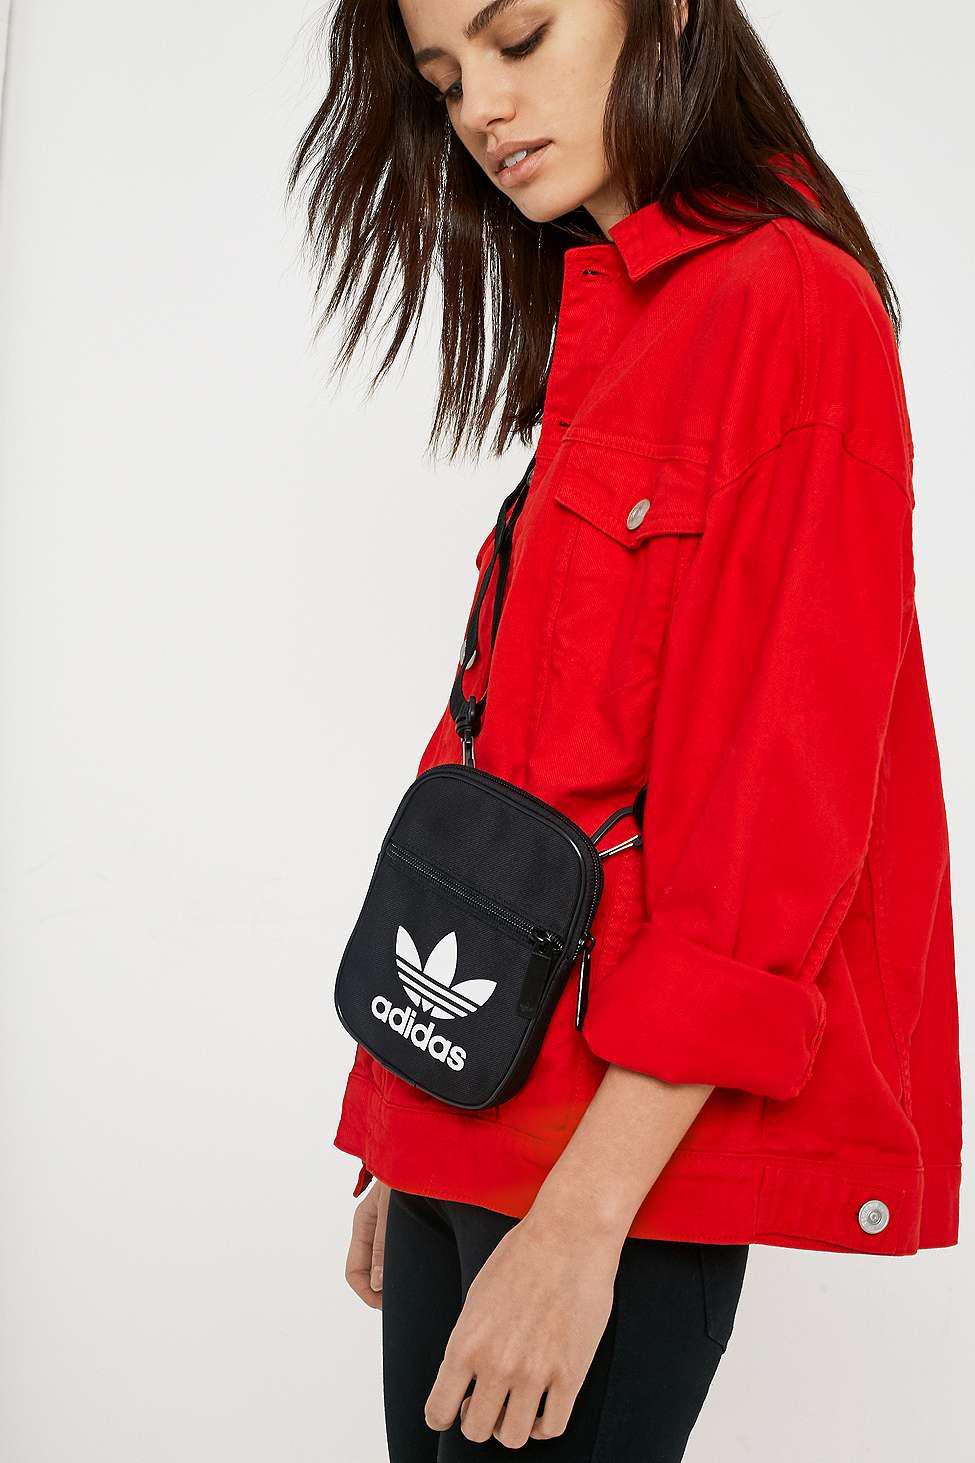 0a89df4d28 adidas Originals Trefoil Festival Crossbody - Womens All in Black - Lyst